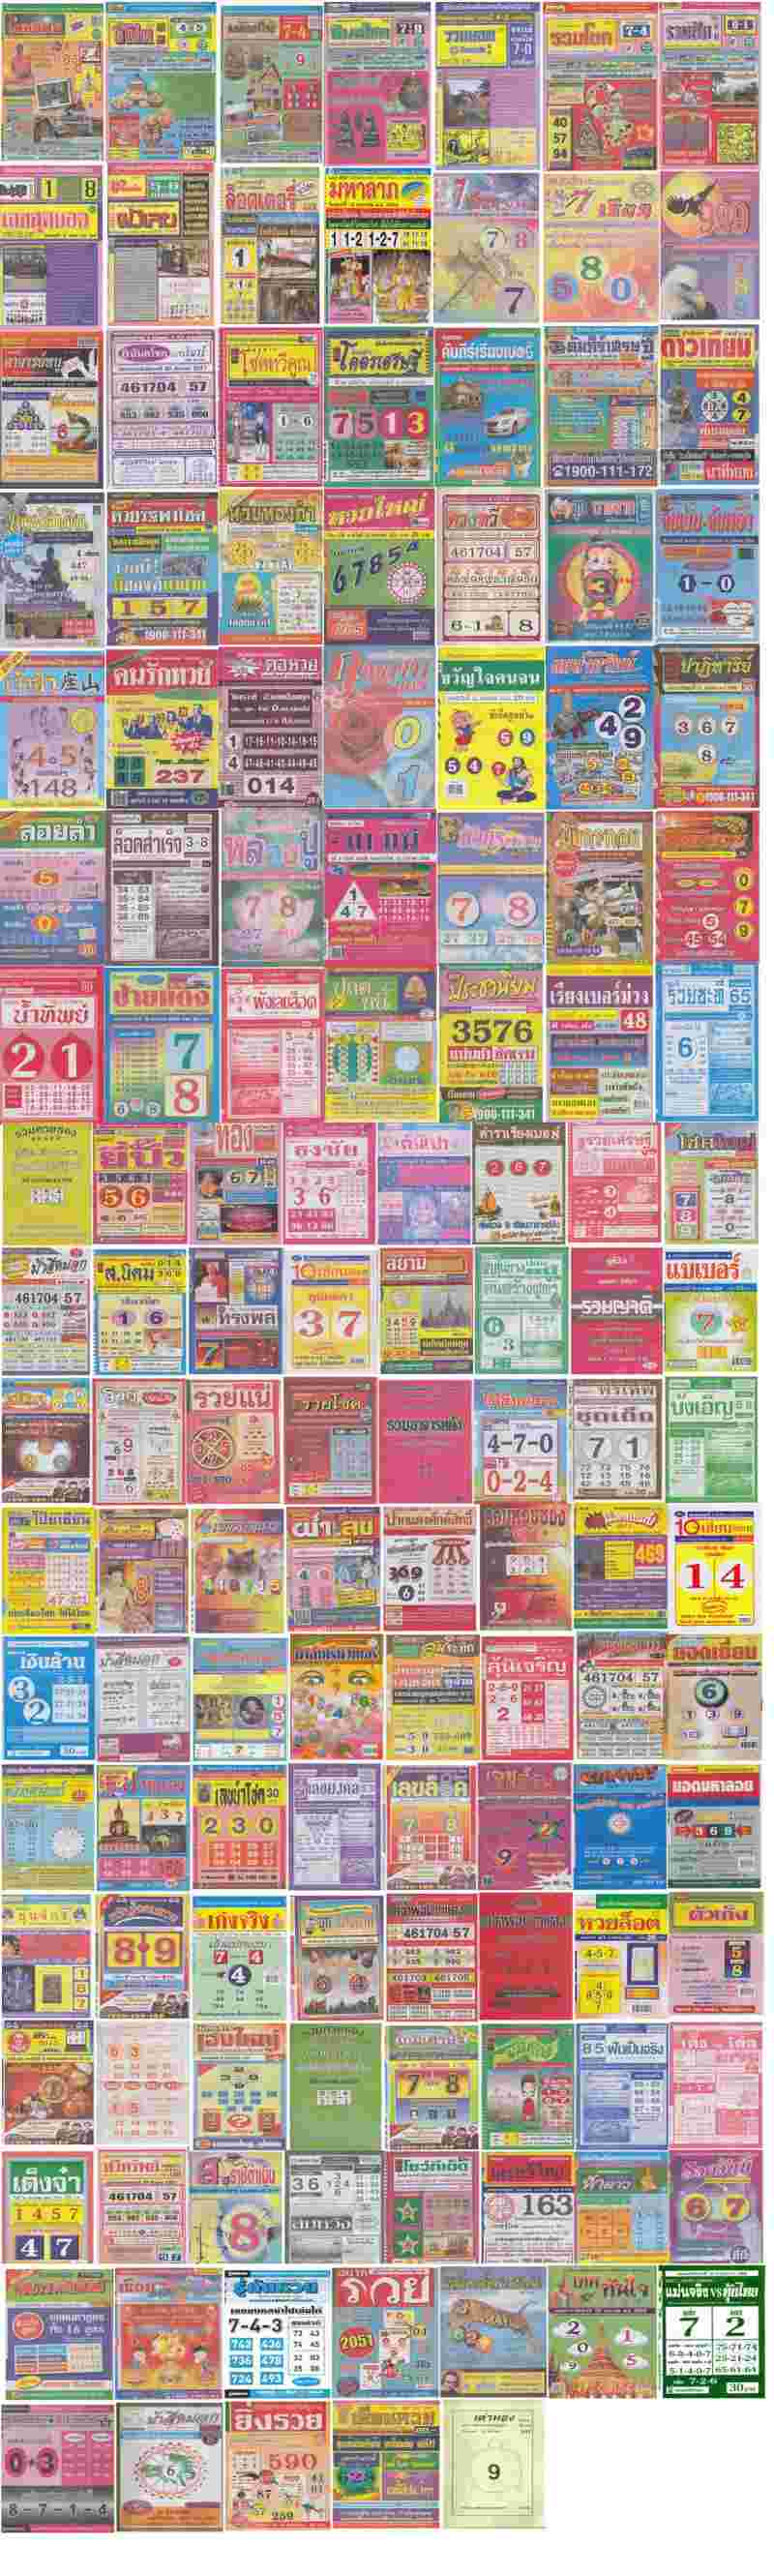 Thailand Lottery Megazine VIP Membership Deatils All10